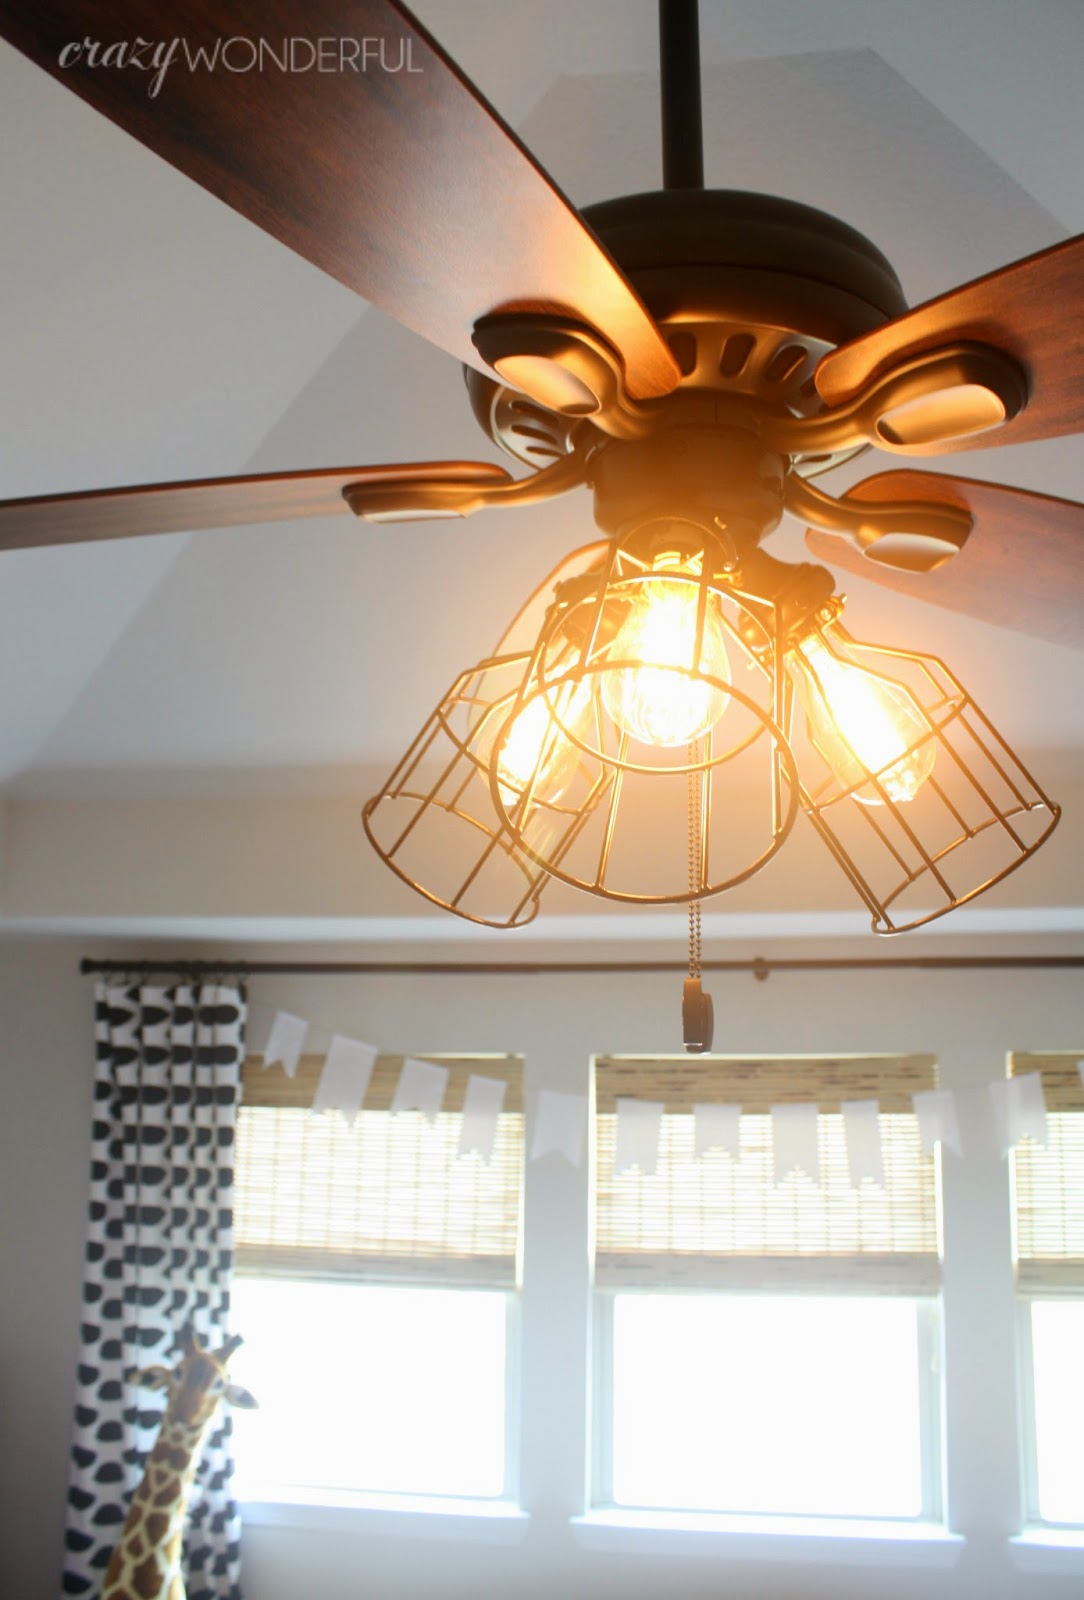 Diy cage light ceiling fan crazy wonderful - Diy ceiling lamps ...